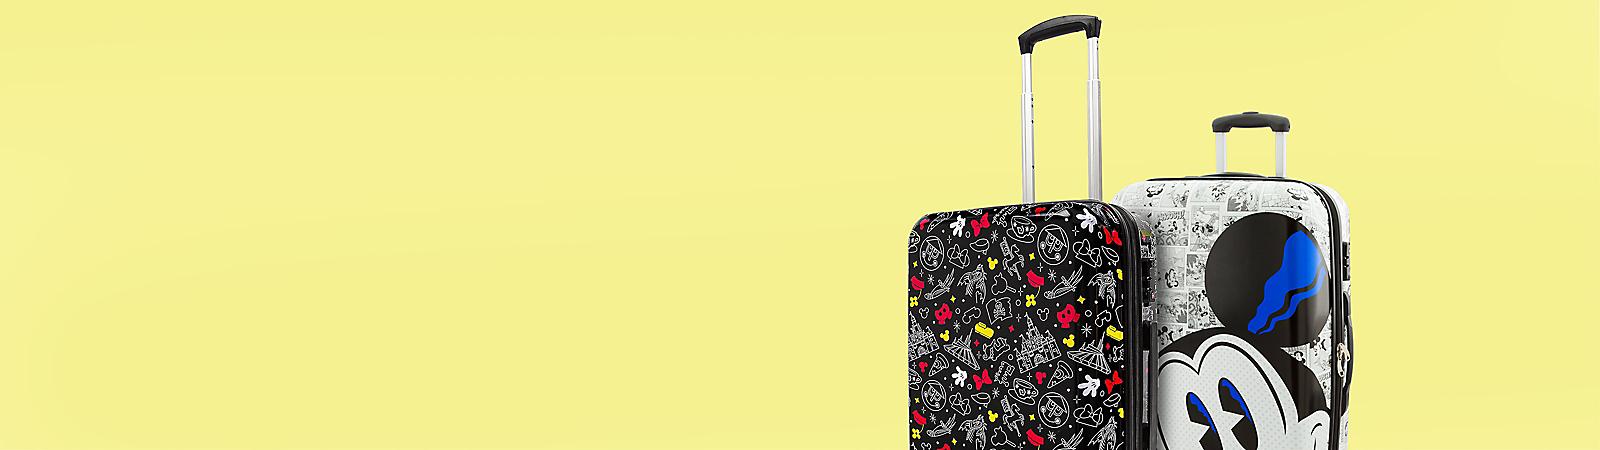 Women's Luggage & Travel